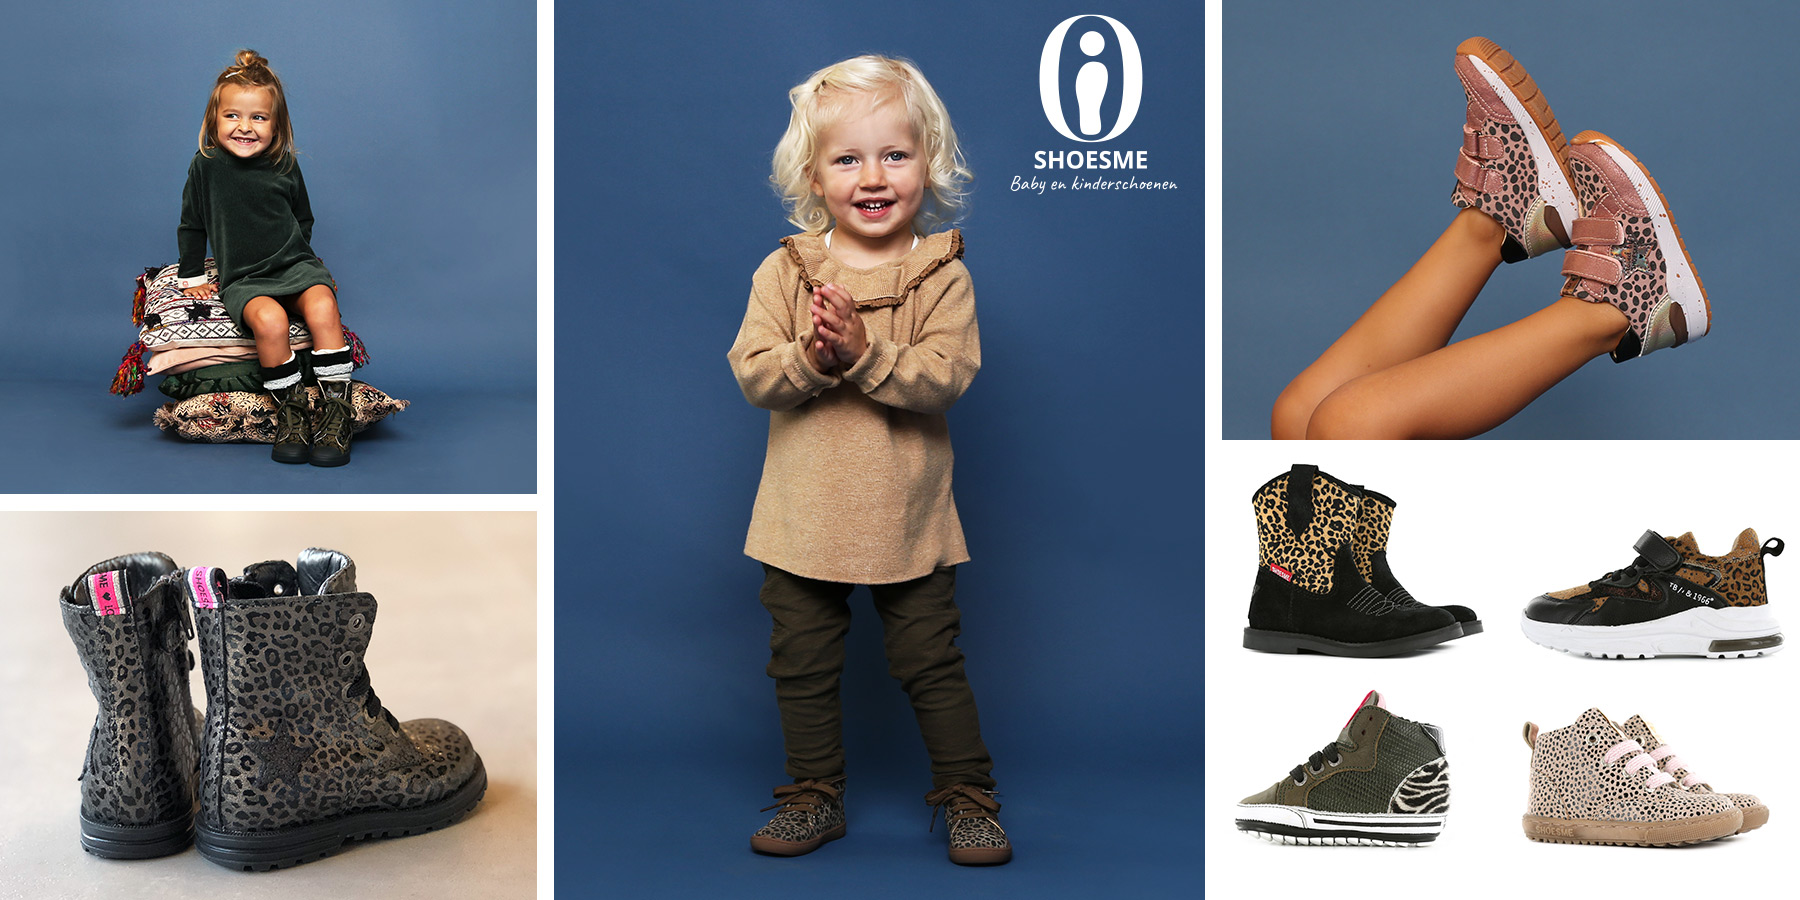 Shoesme animalprint collage